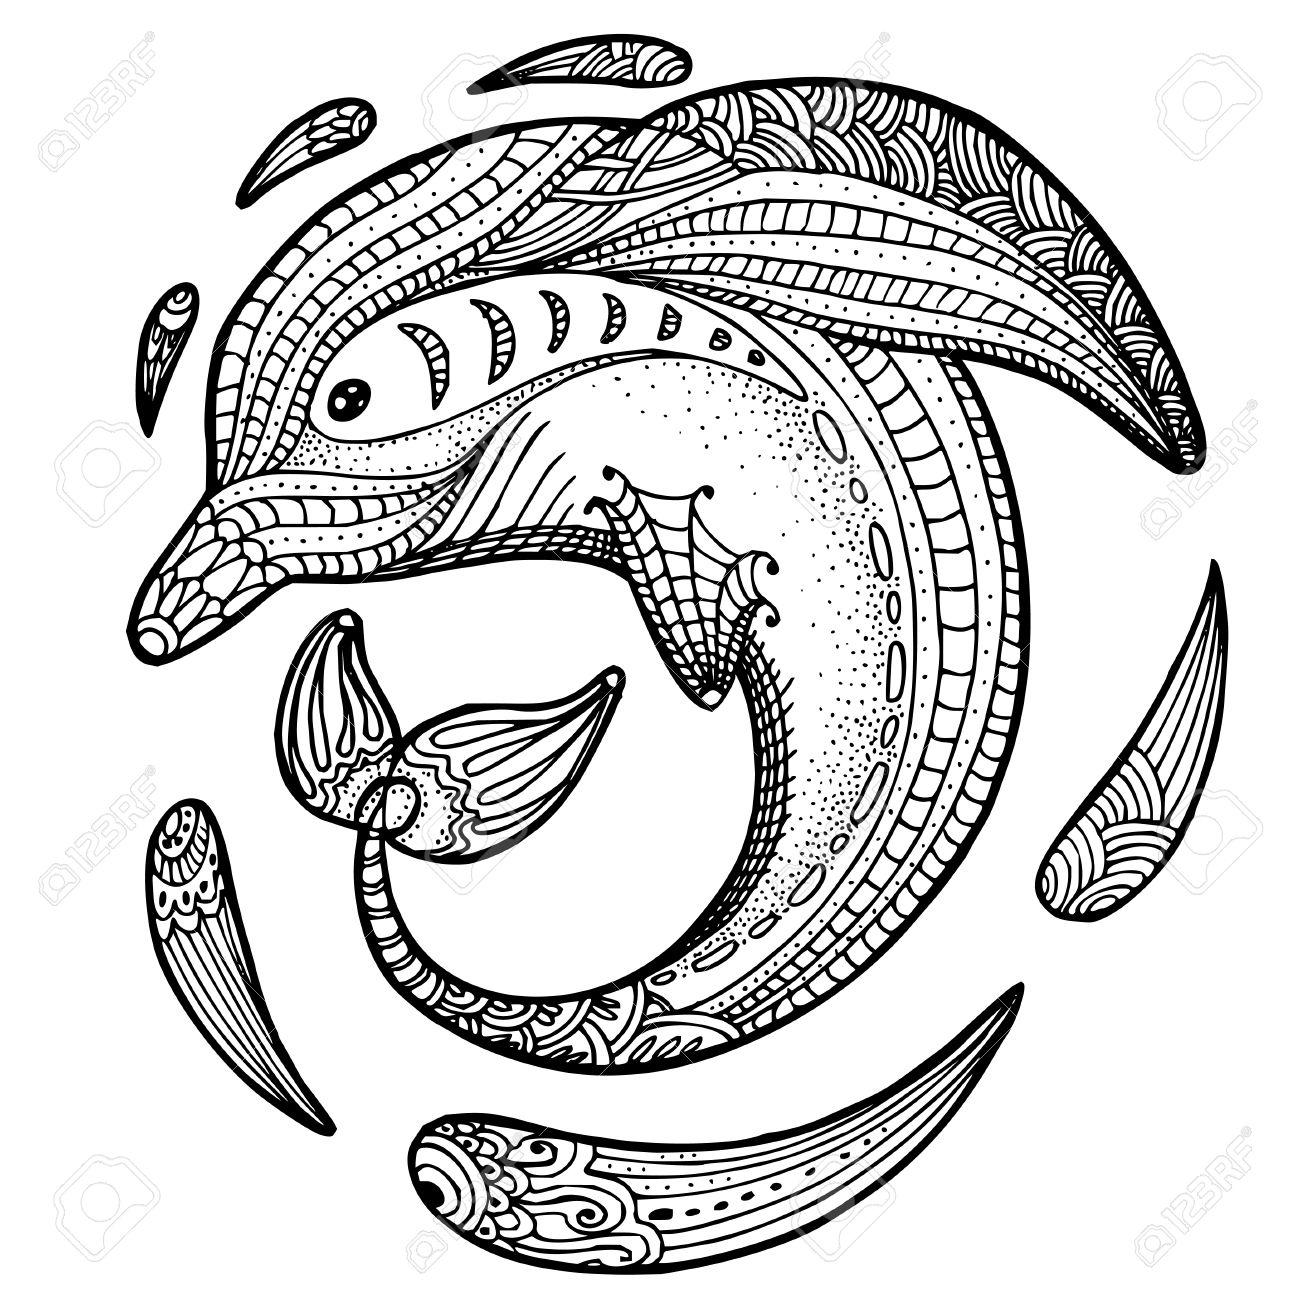 Zentangle Imagen Estilizada De Totem Animal Delfines Pagina Adulto